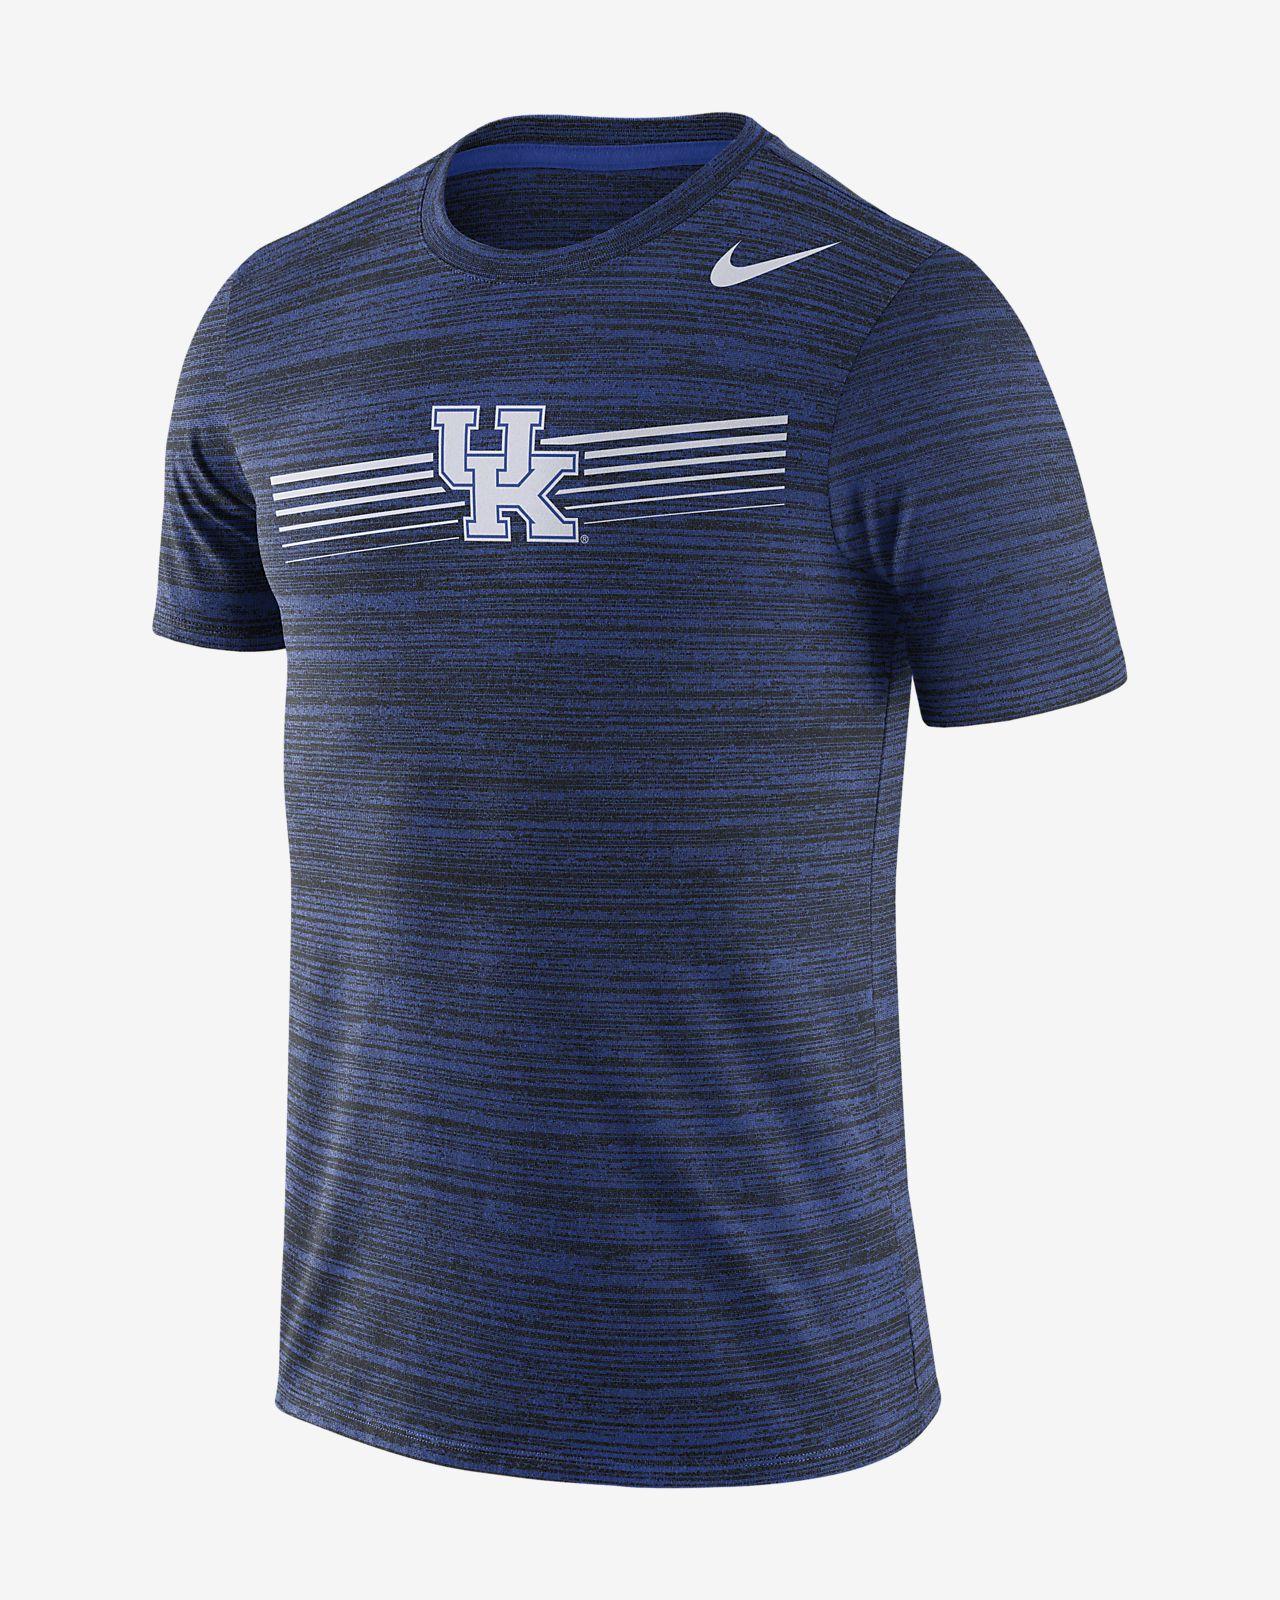 dc7cd6492 Nike College Dri-FIT Legend Velocity (Kentucky) Men's T-Shirt. Nike.com